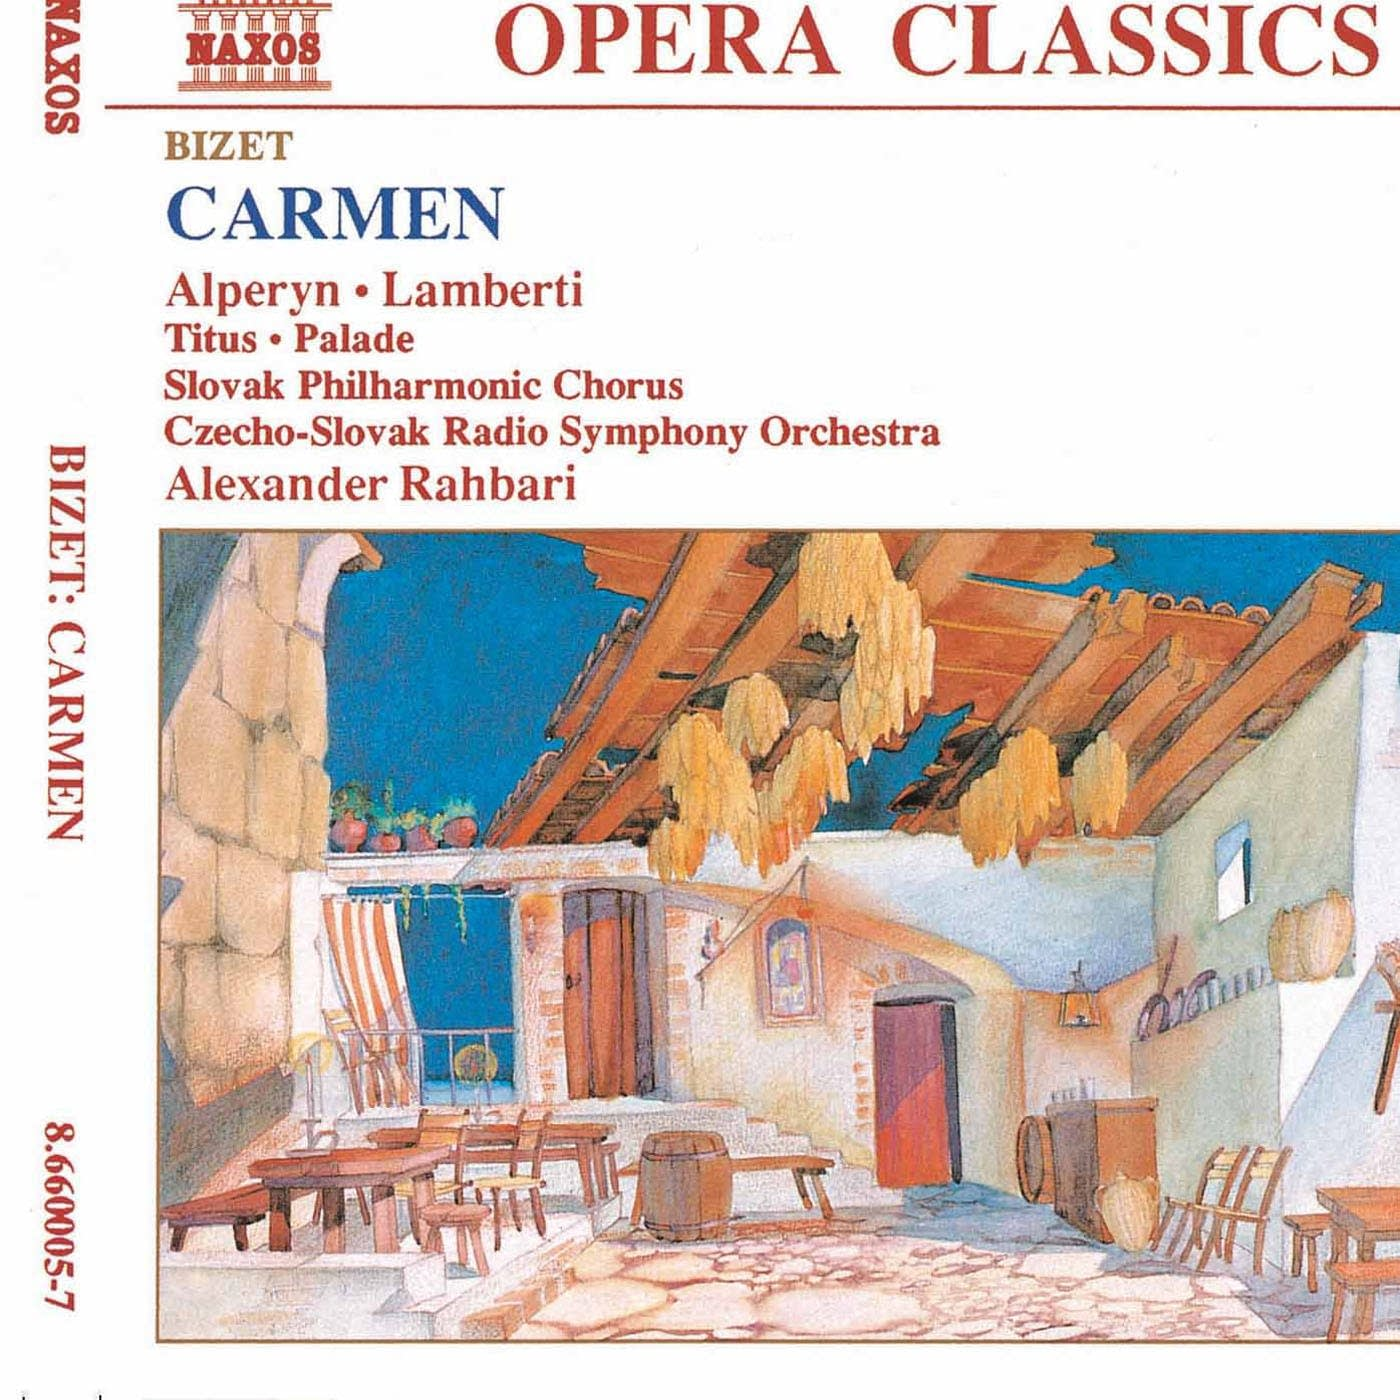 Georges Bizet - Carmen: Bullfighter's Chorus